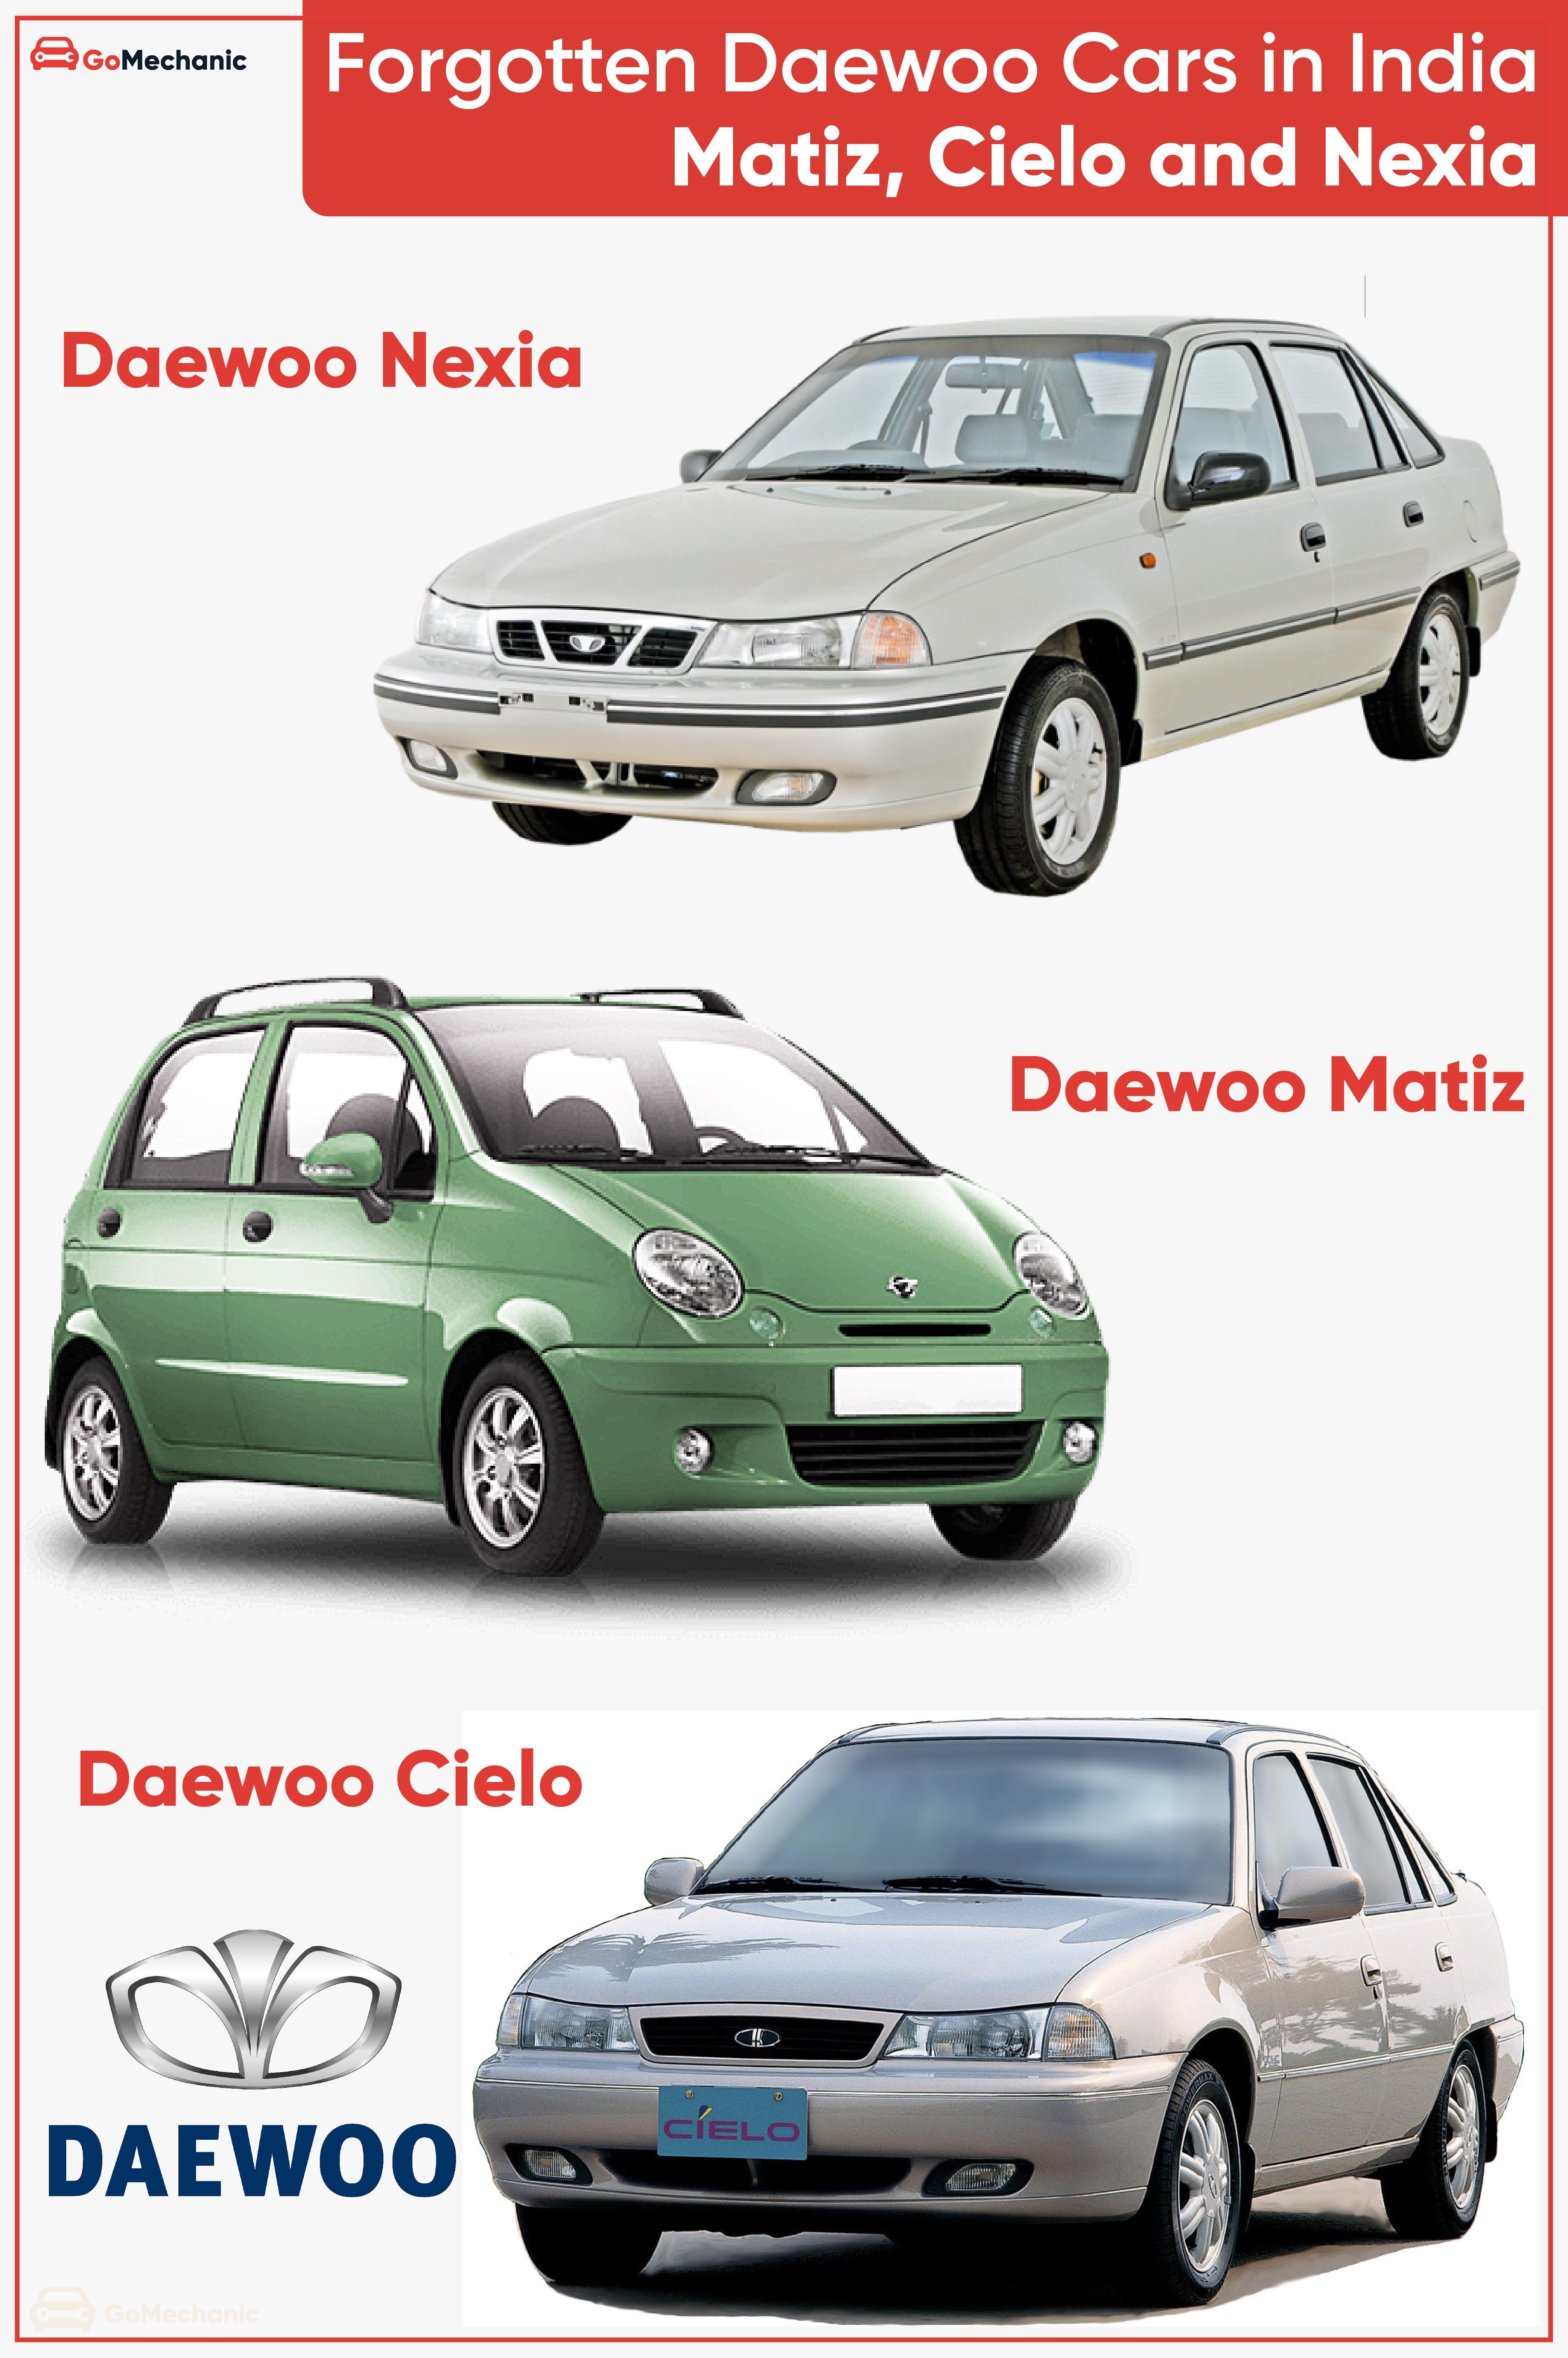 The Forgotten Daewoo Cars In India In 2020 Daewoo Car Ins Car